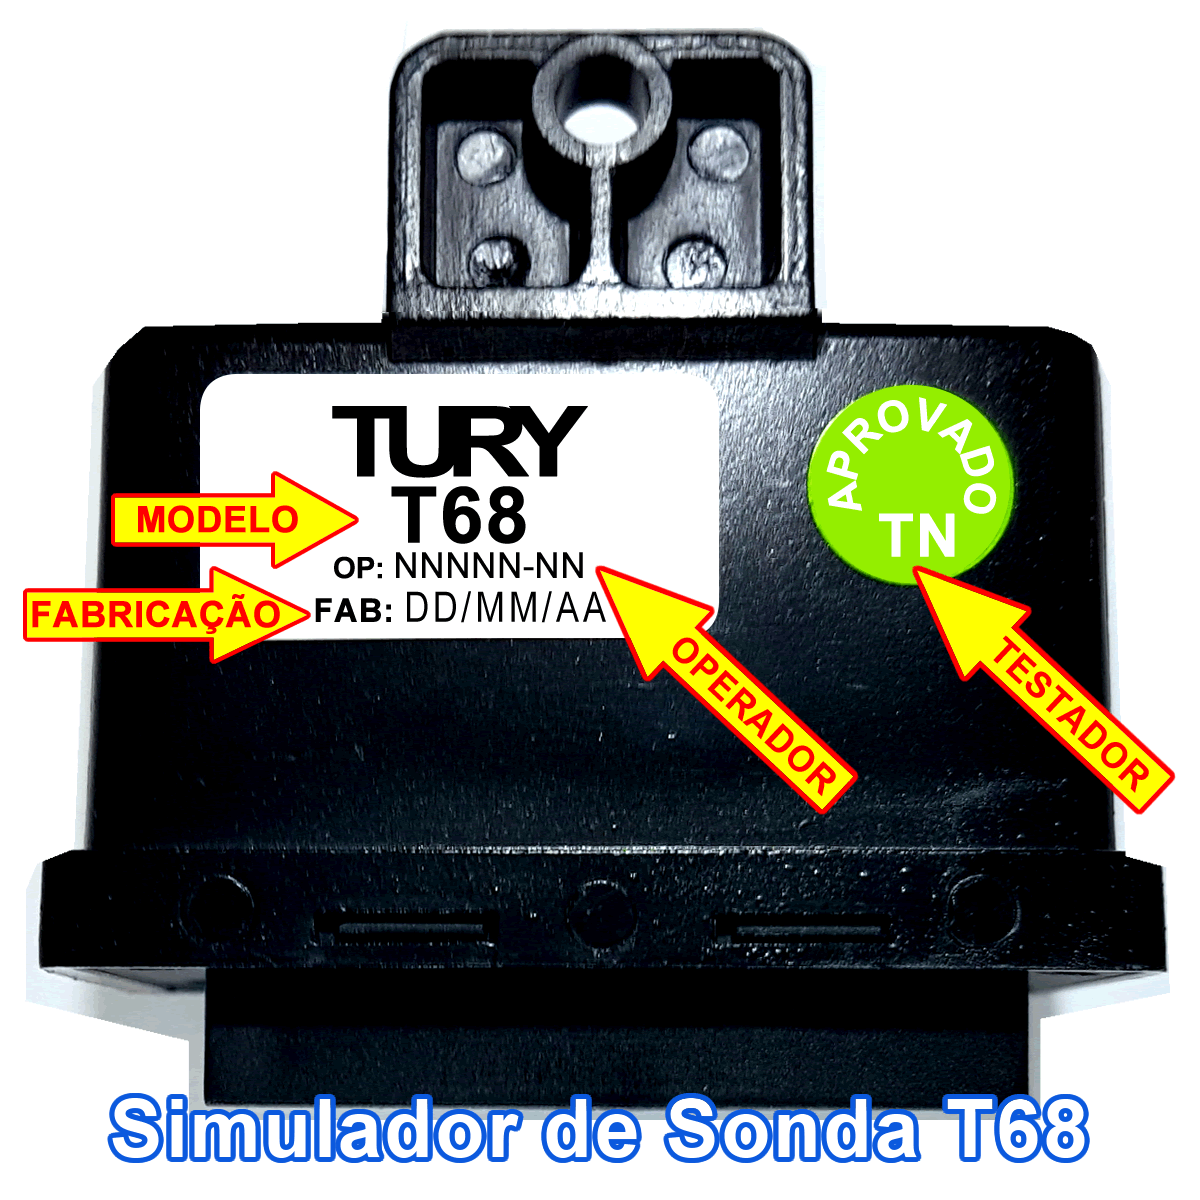 Chave Comutadora T1200A e Simulador de Sonda T68 TURY GAS